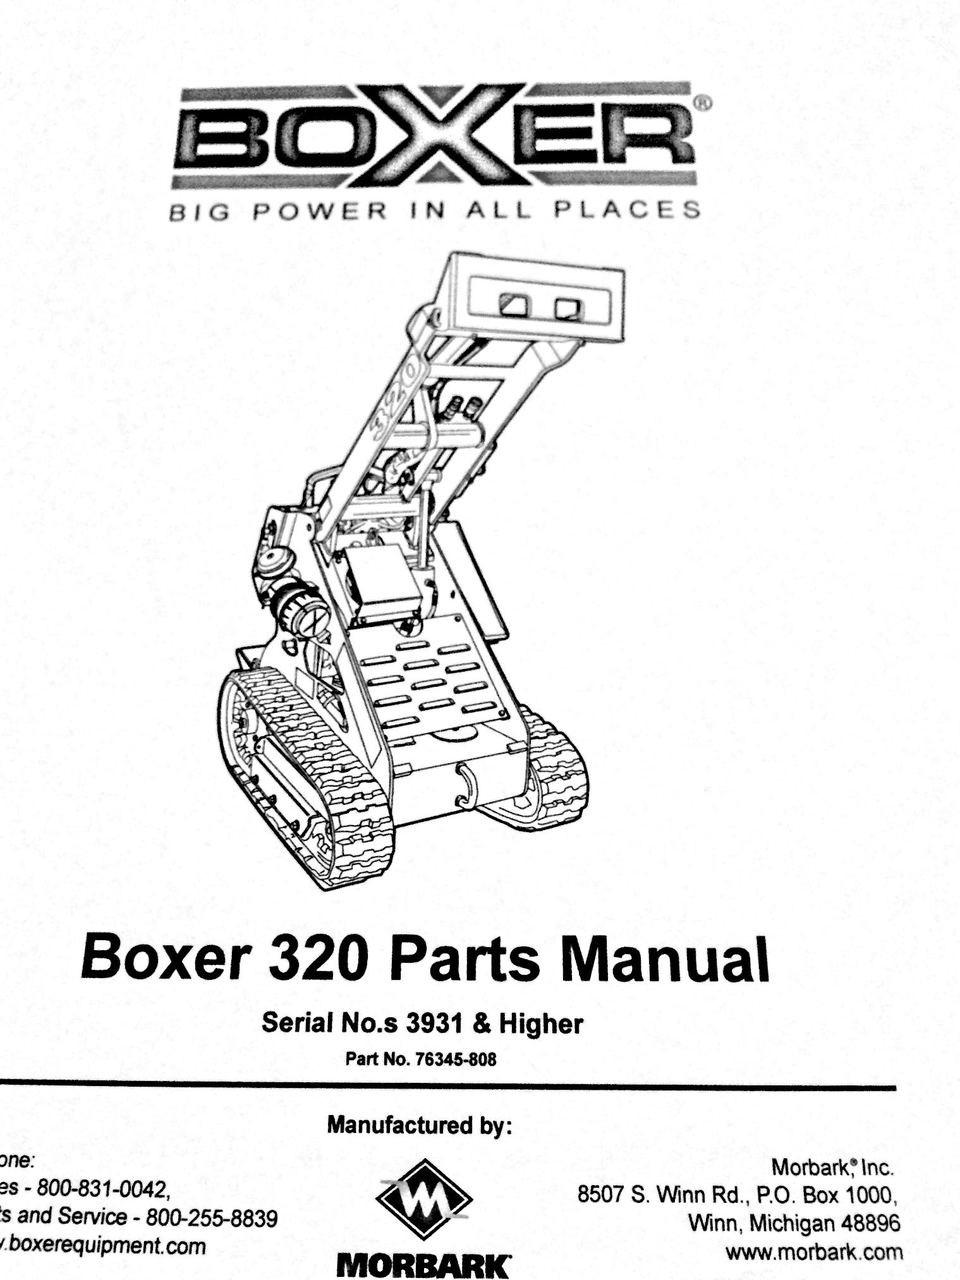 Boxer 320 Parts Manual